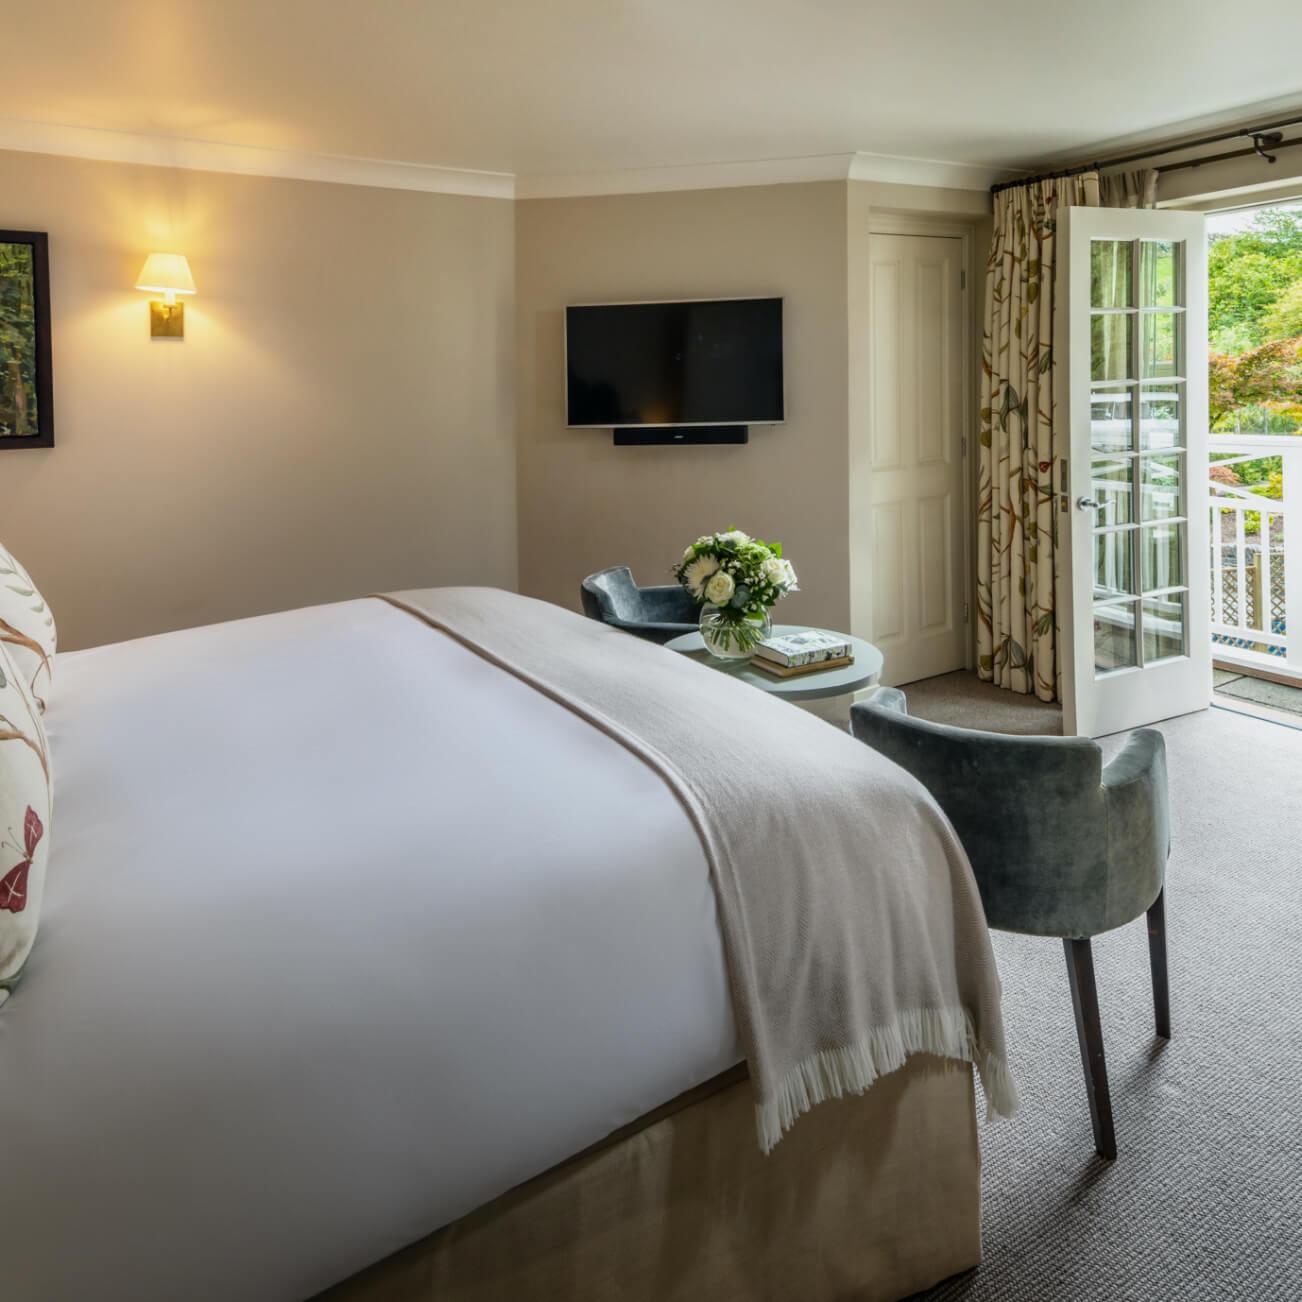 Linthwaite House - Deluxe Room